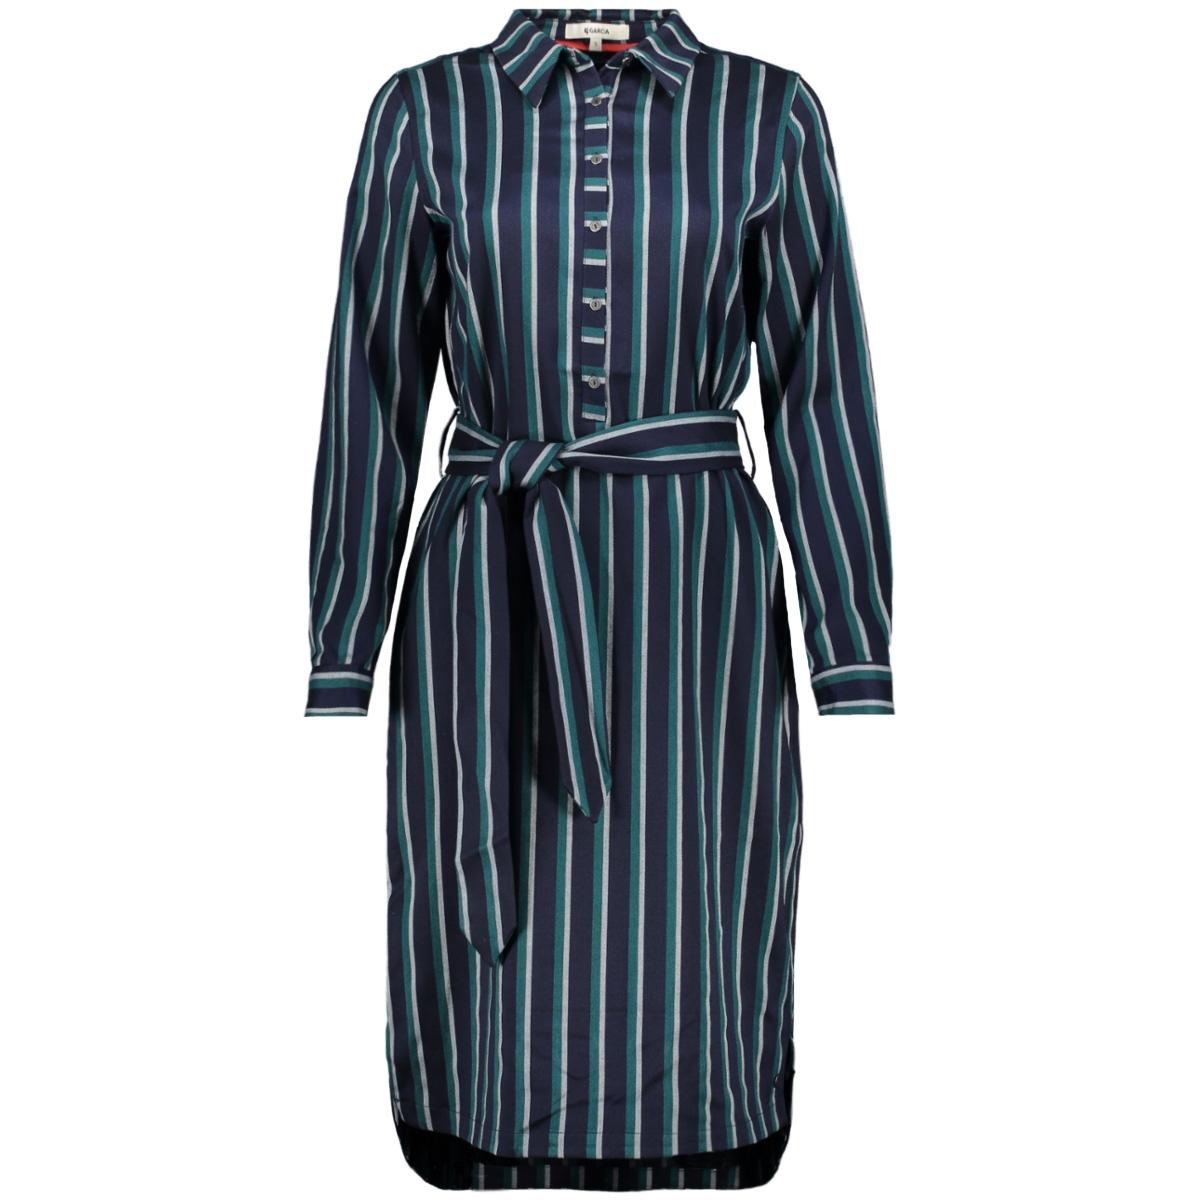 jurk met strepen j90282 garcia jurk 292 dark moon